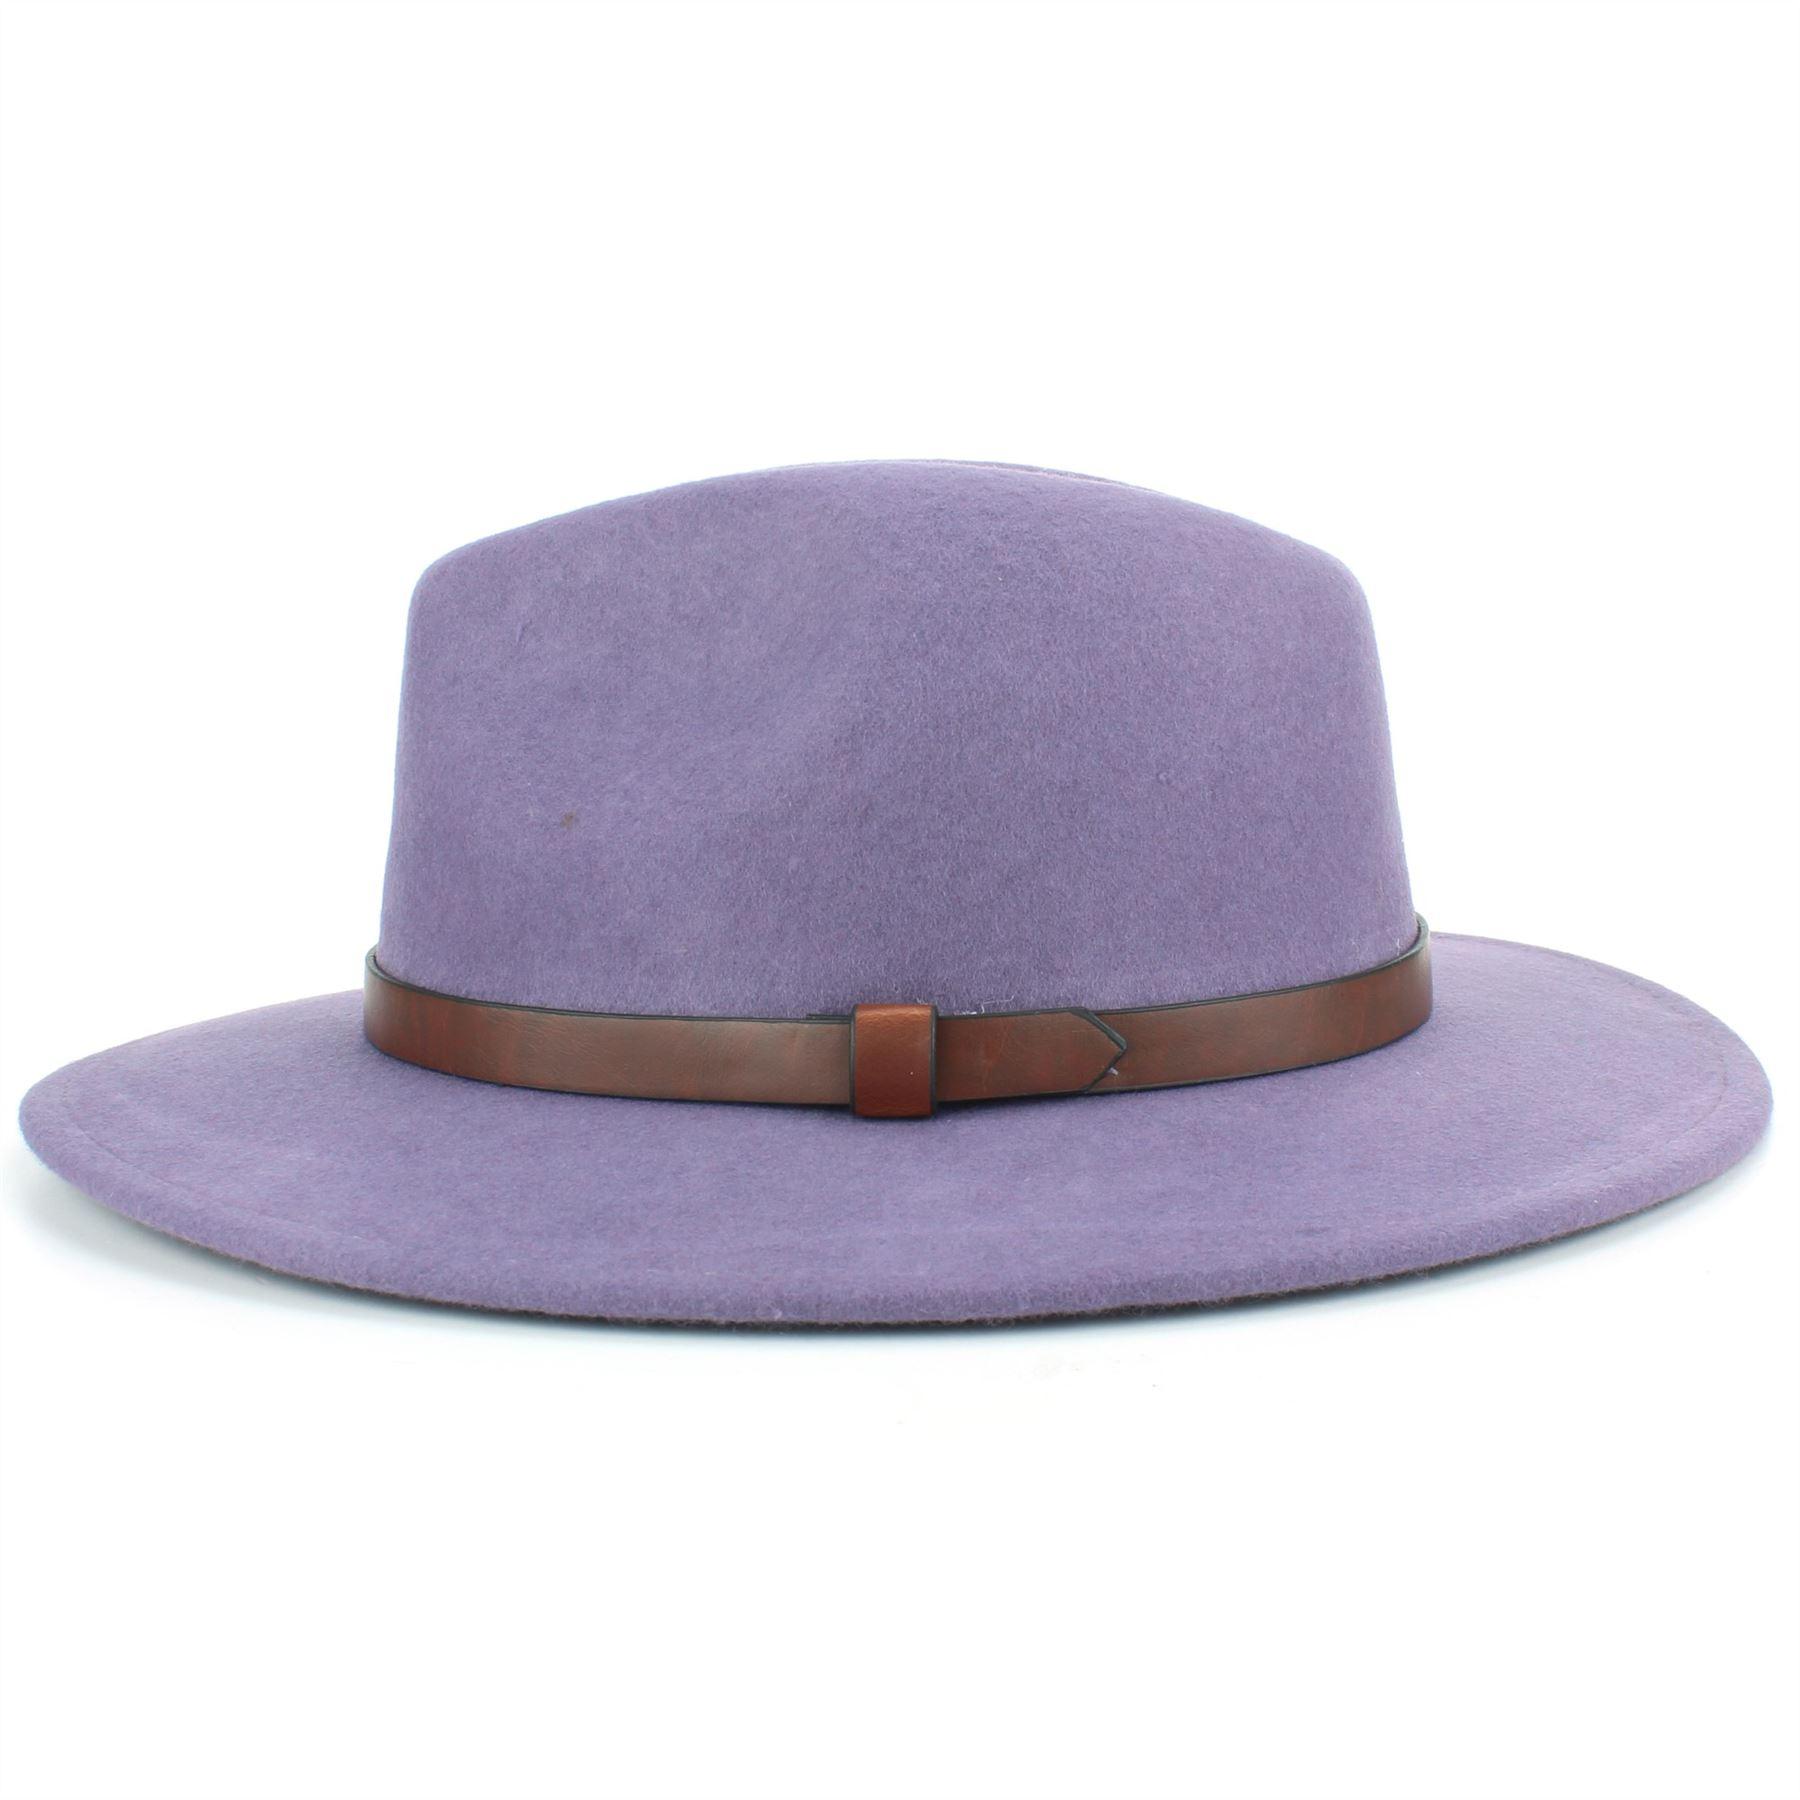 Fedora-Hat-Wool-Felt-Hawkins-Feather-Band-Trilby-Ladies-Men-Travel-Brim-Travel thumbnail 8